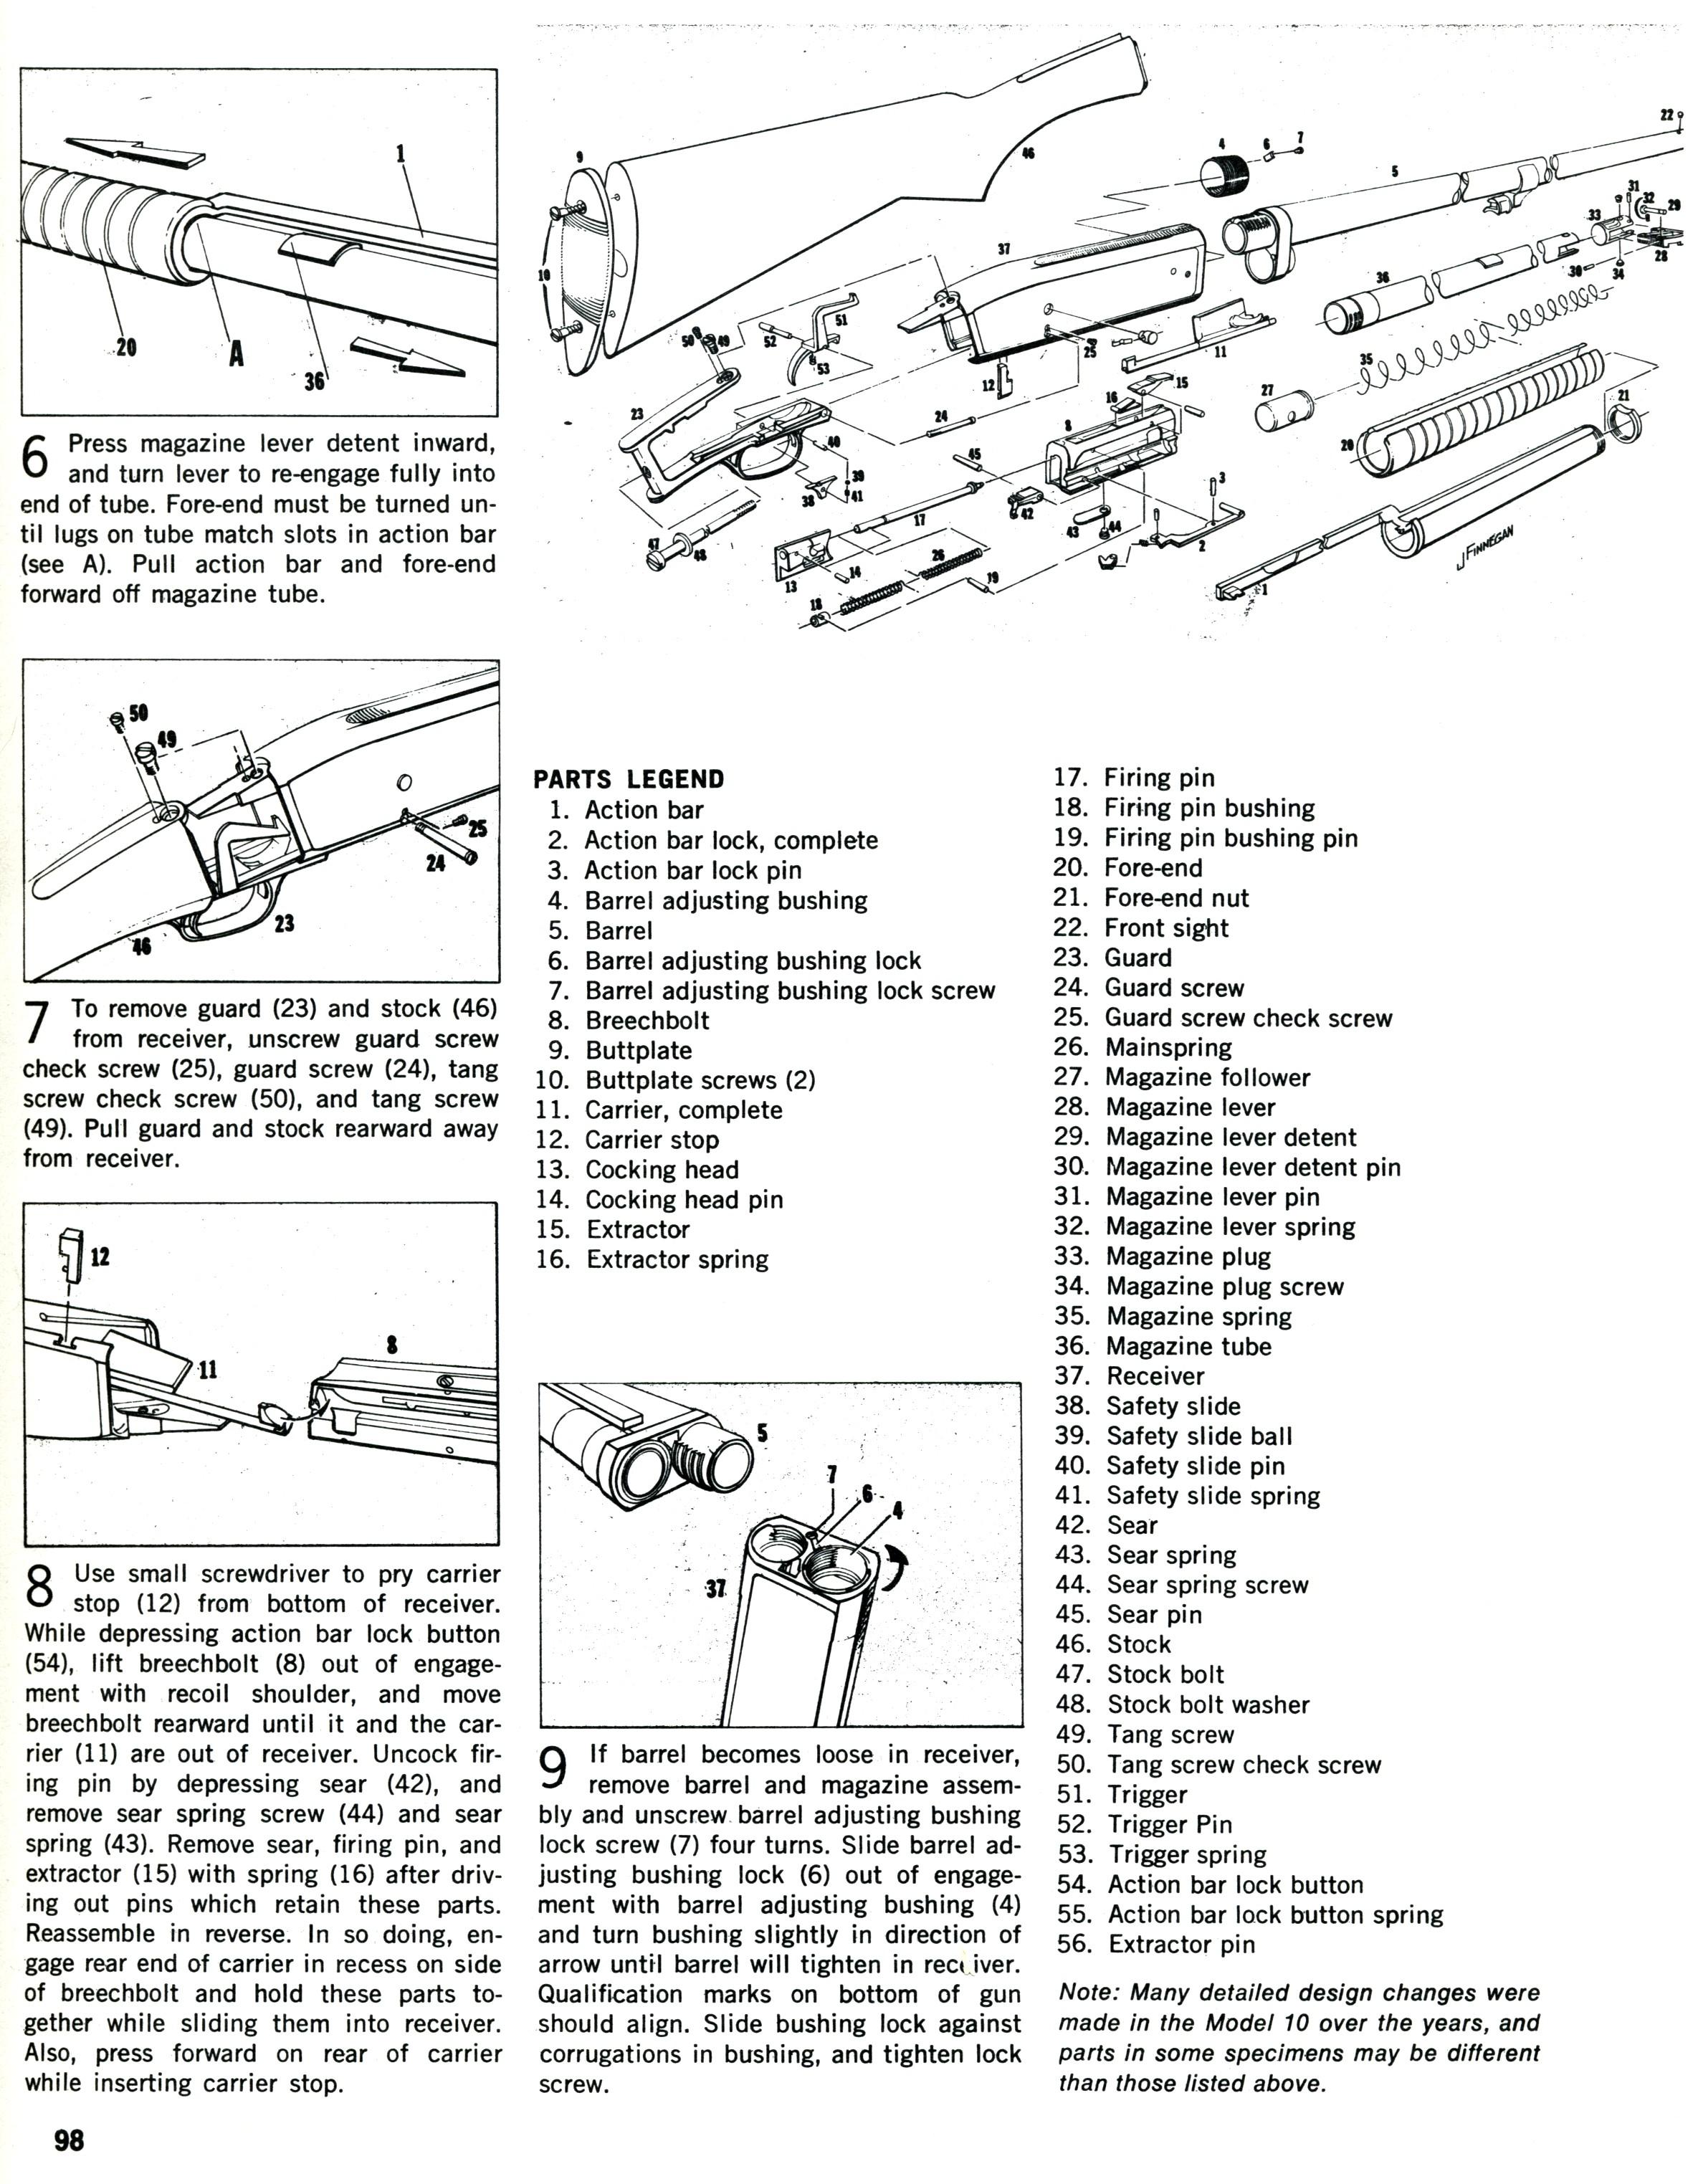 Remington To Model 10 12 Gauge What It Worth